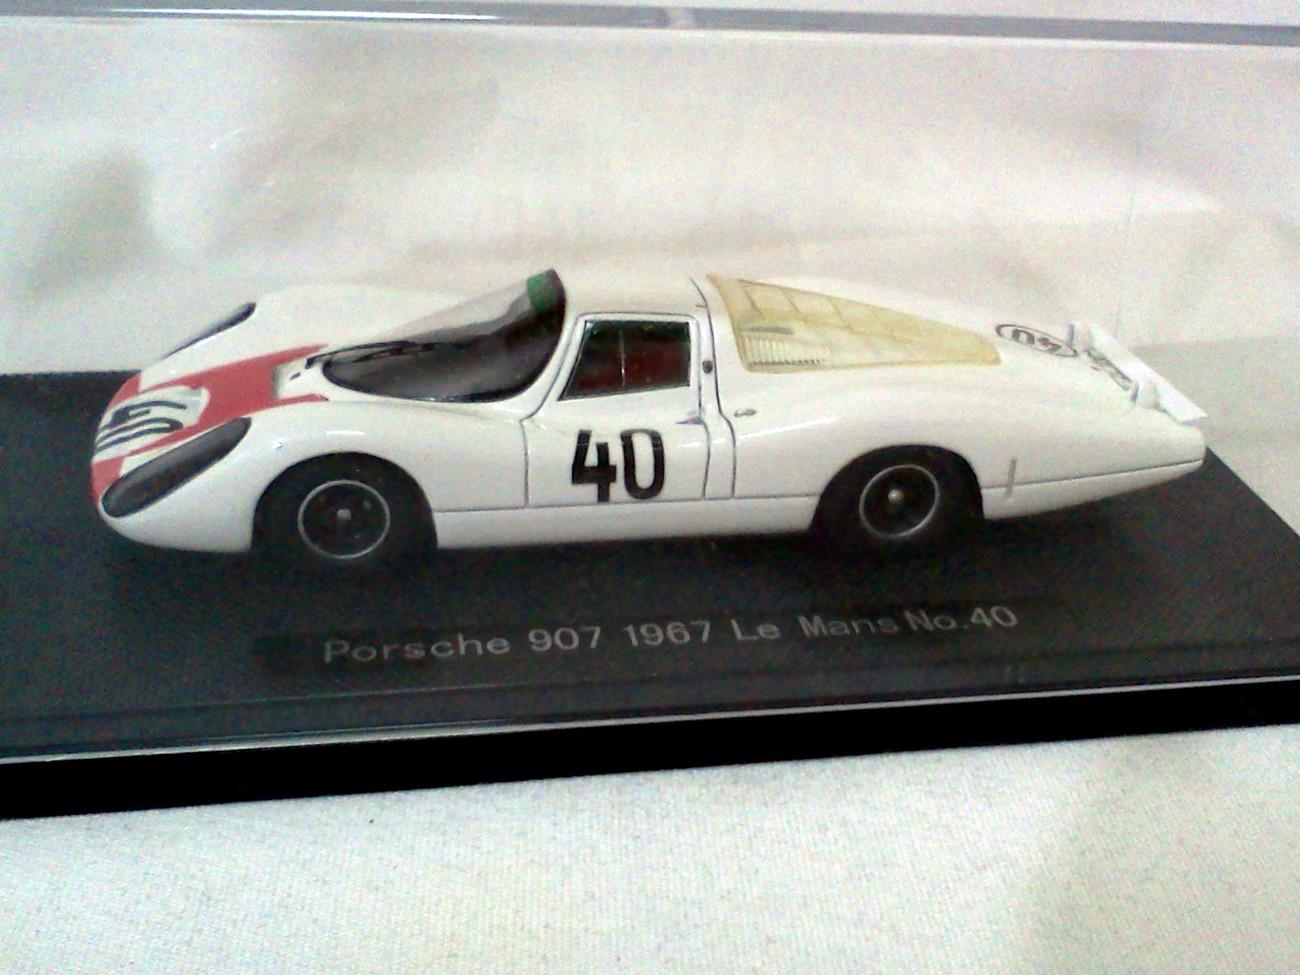 Porsche 907 Le Mans #40 White/Red 1/43 Resin Model Car